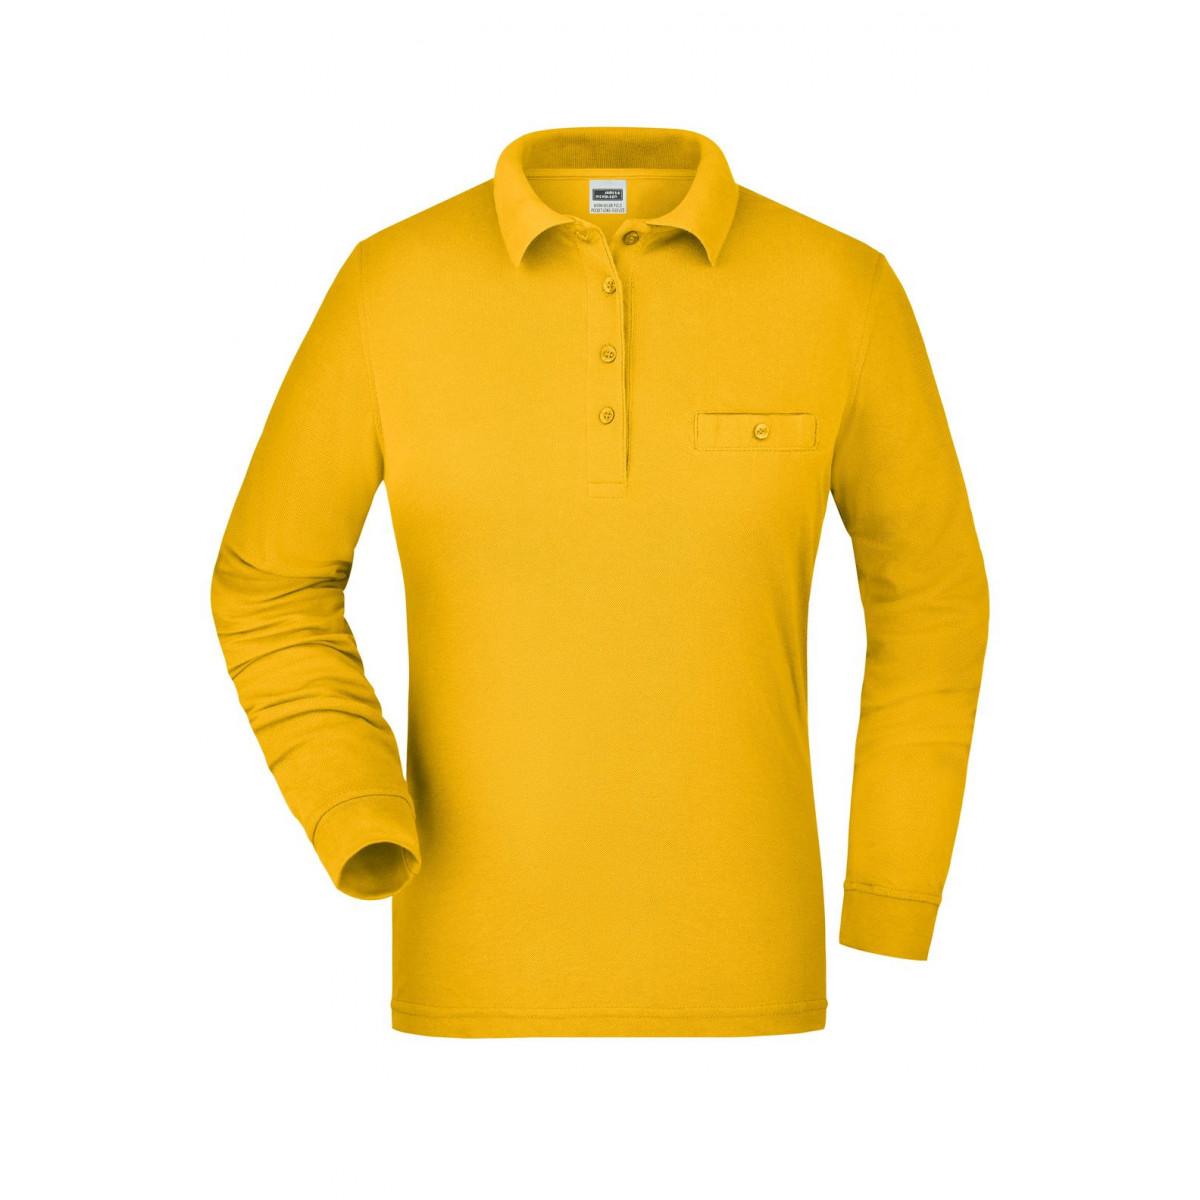 Рубашка поло женская JN865 Ladies Workwear Polo Pocket Longsleeve - Золоистый желтый